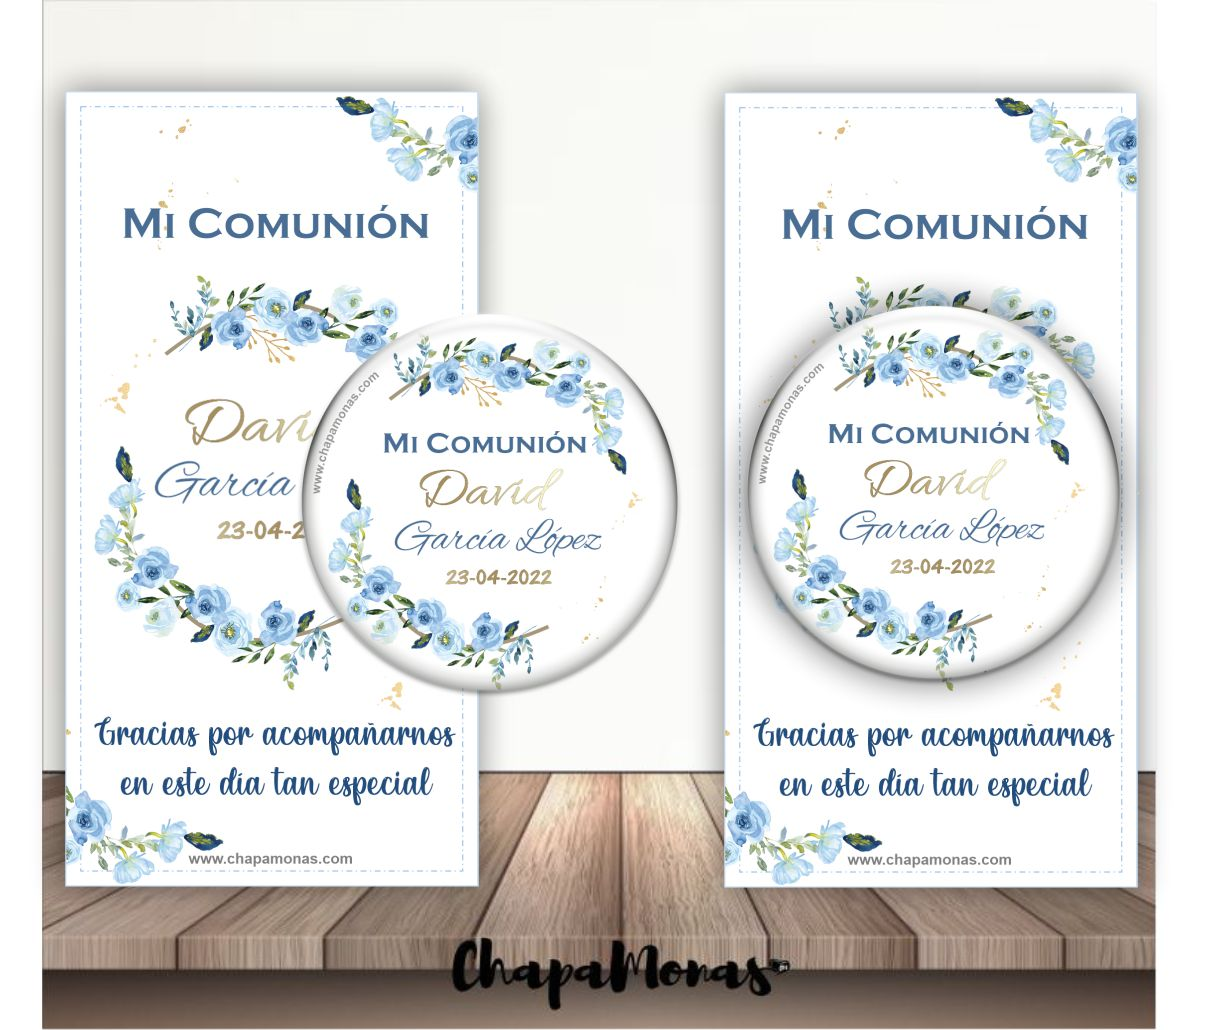 CHAPA PARA COMUNION FLORES (Iman, Abrebotellas, Espejitos..)